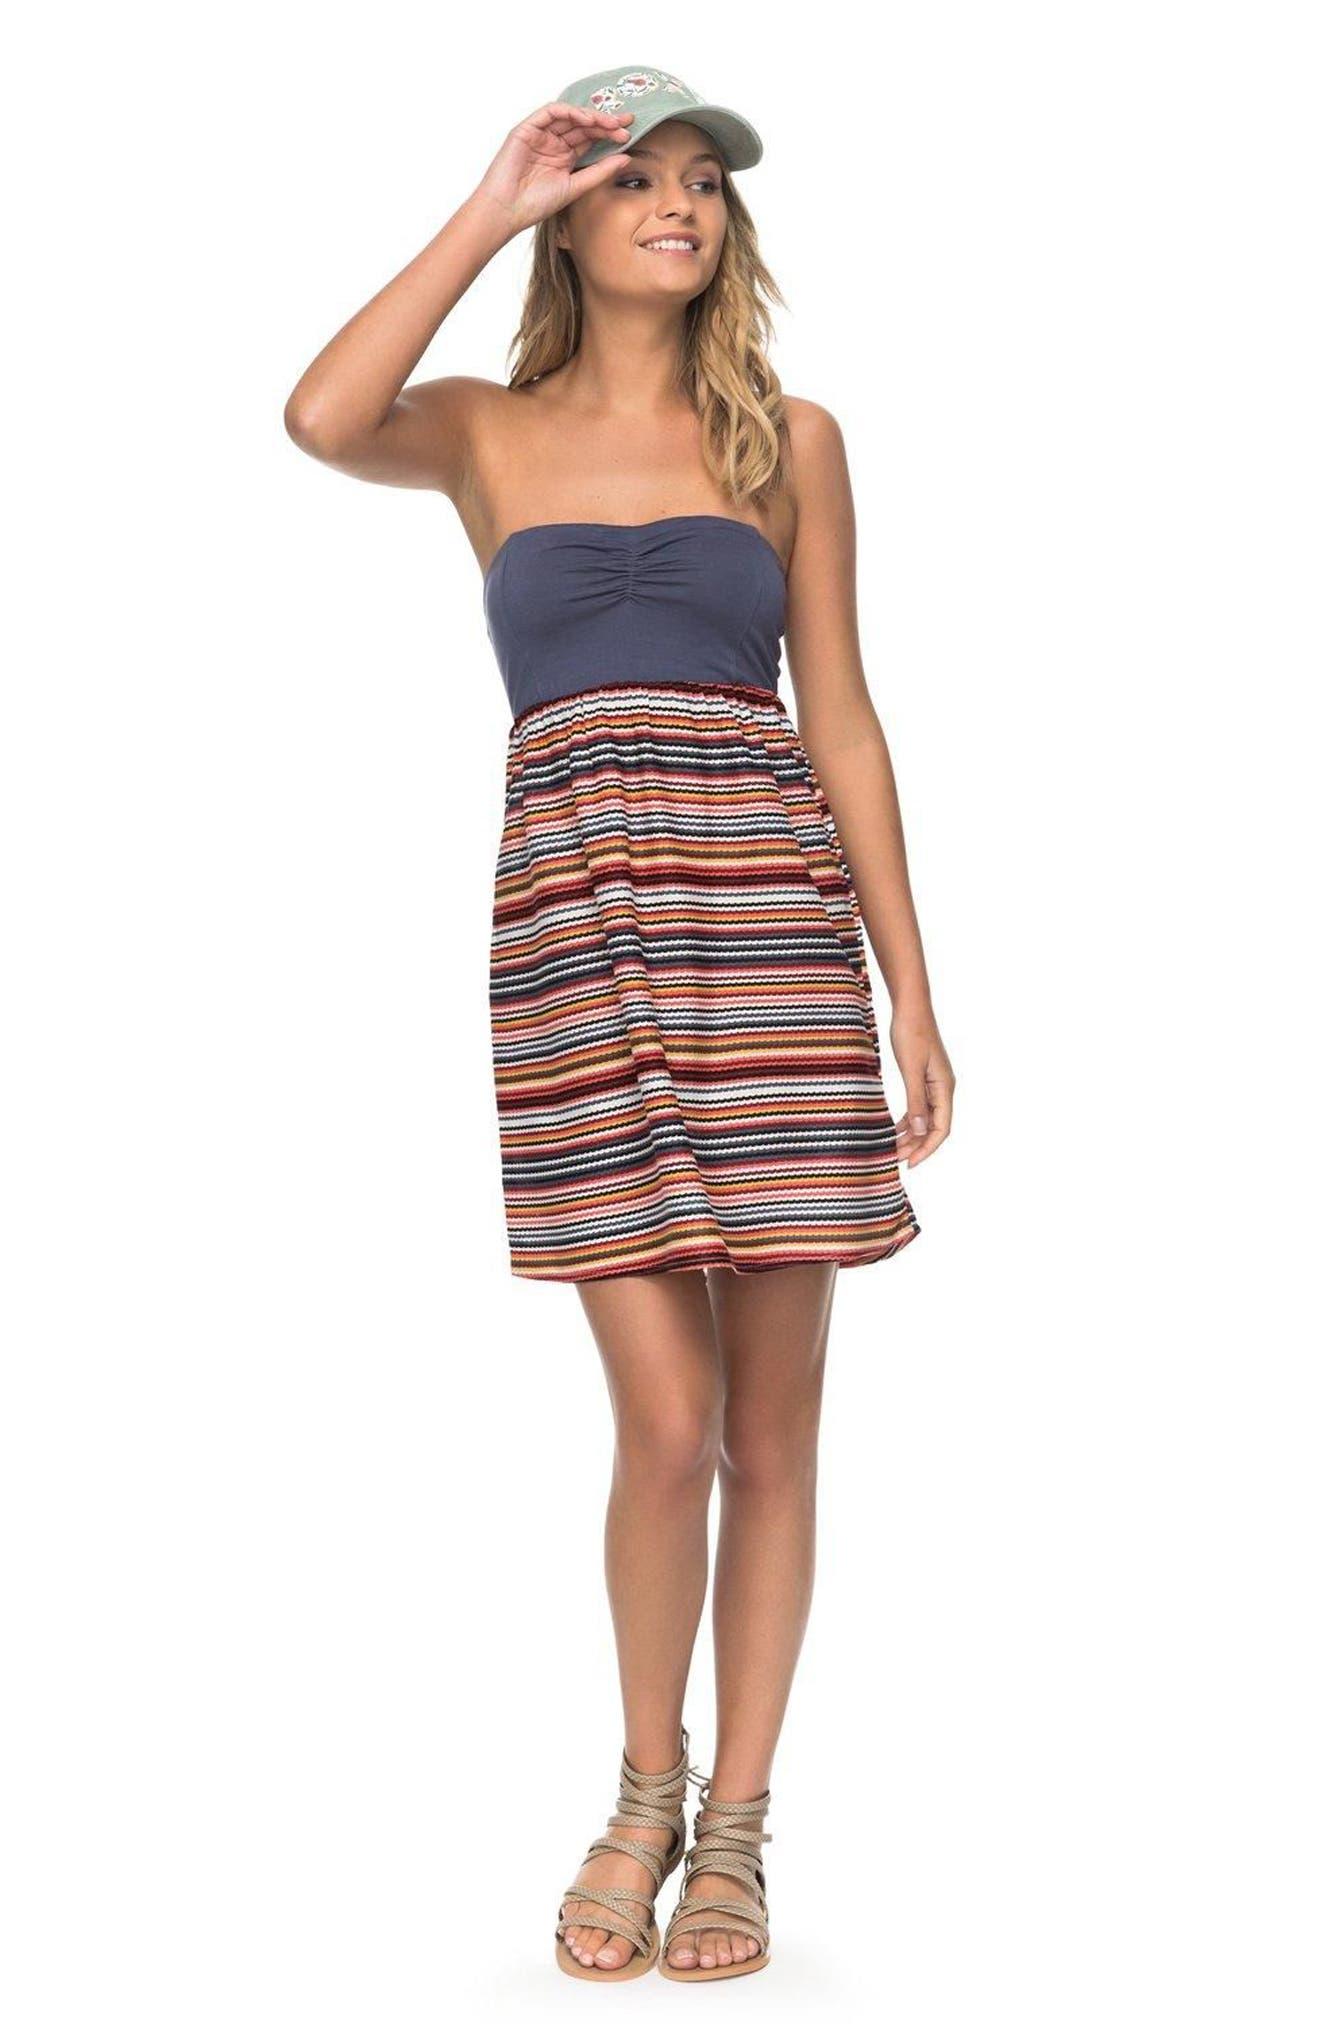 Ocean Romance Strapless Dress,                             Alternate thumbnail 2, color,                             Rio Red Zigzag Stripe